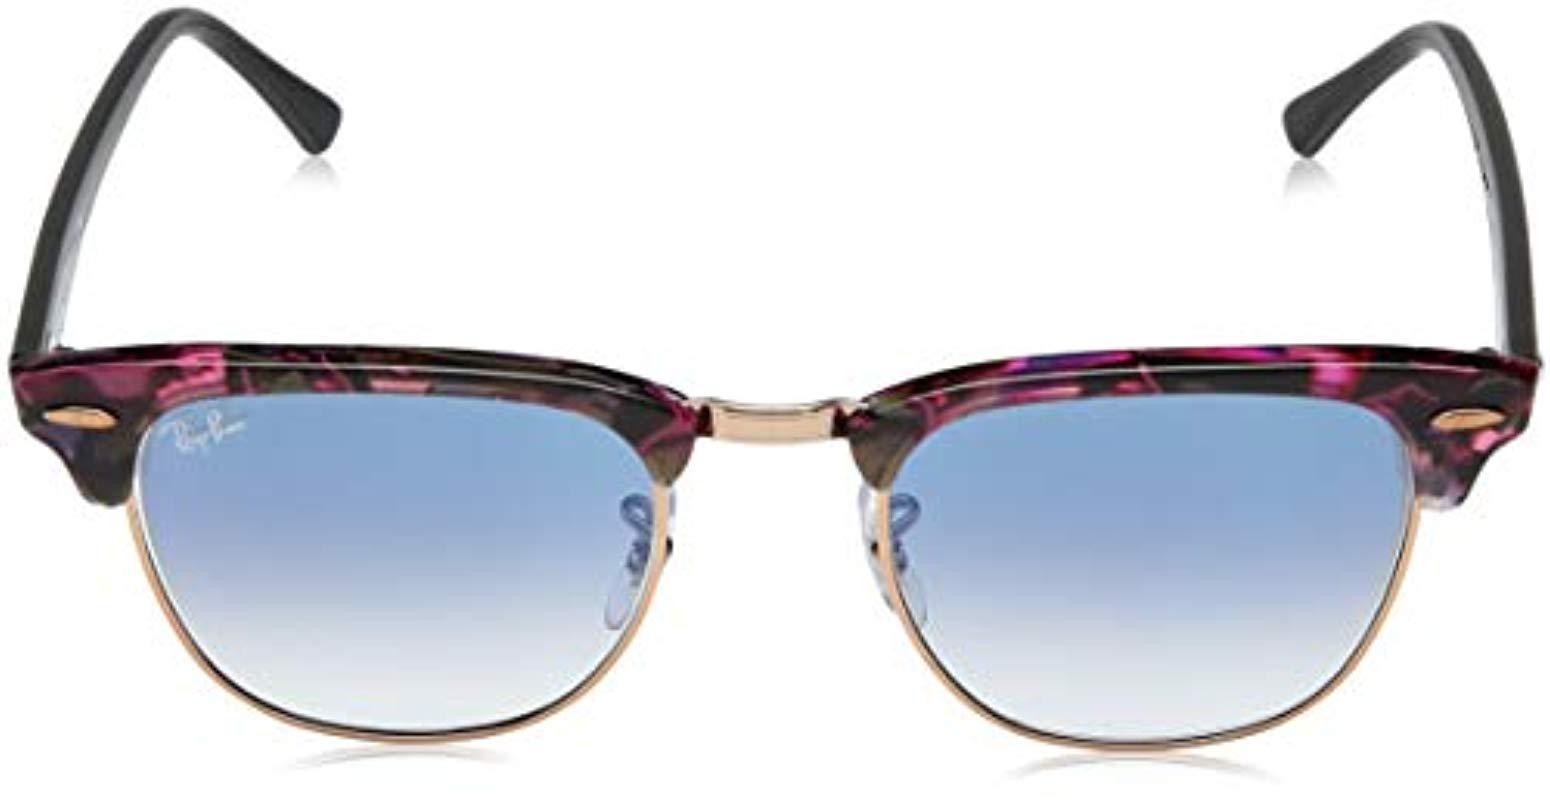 19c304babca80 Lyst - Ray-Ban Clubmaster Square Sunglasses